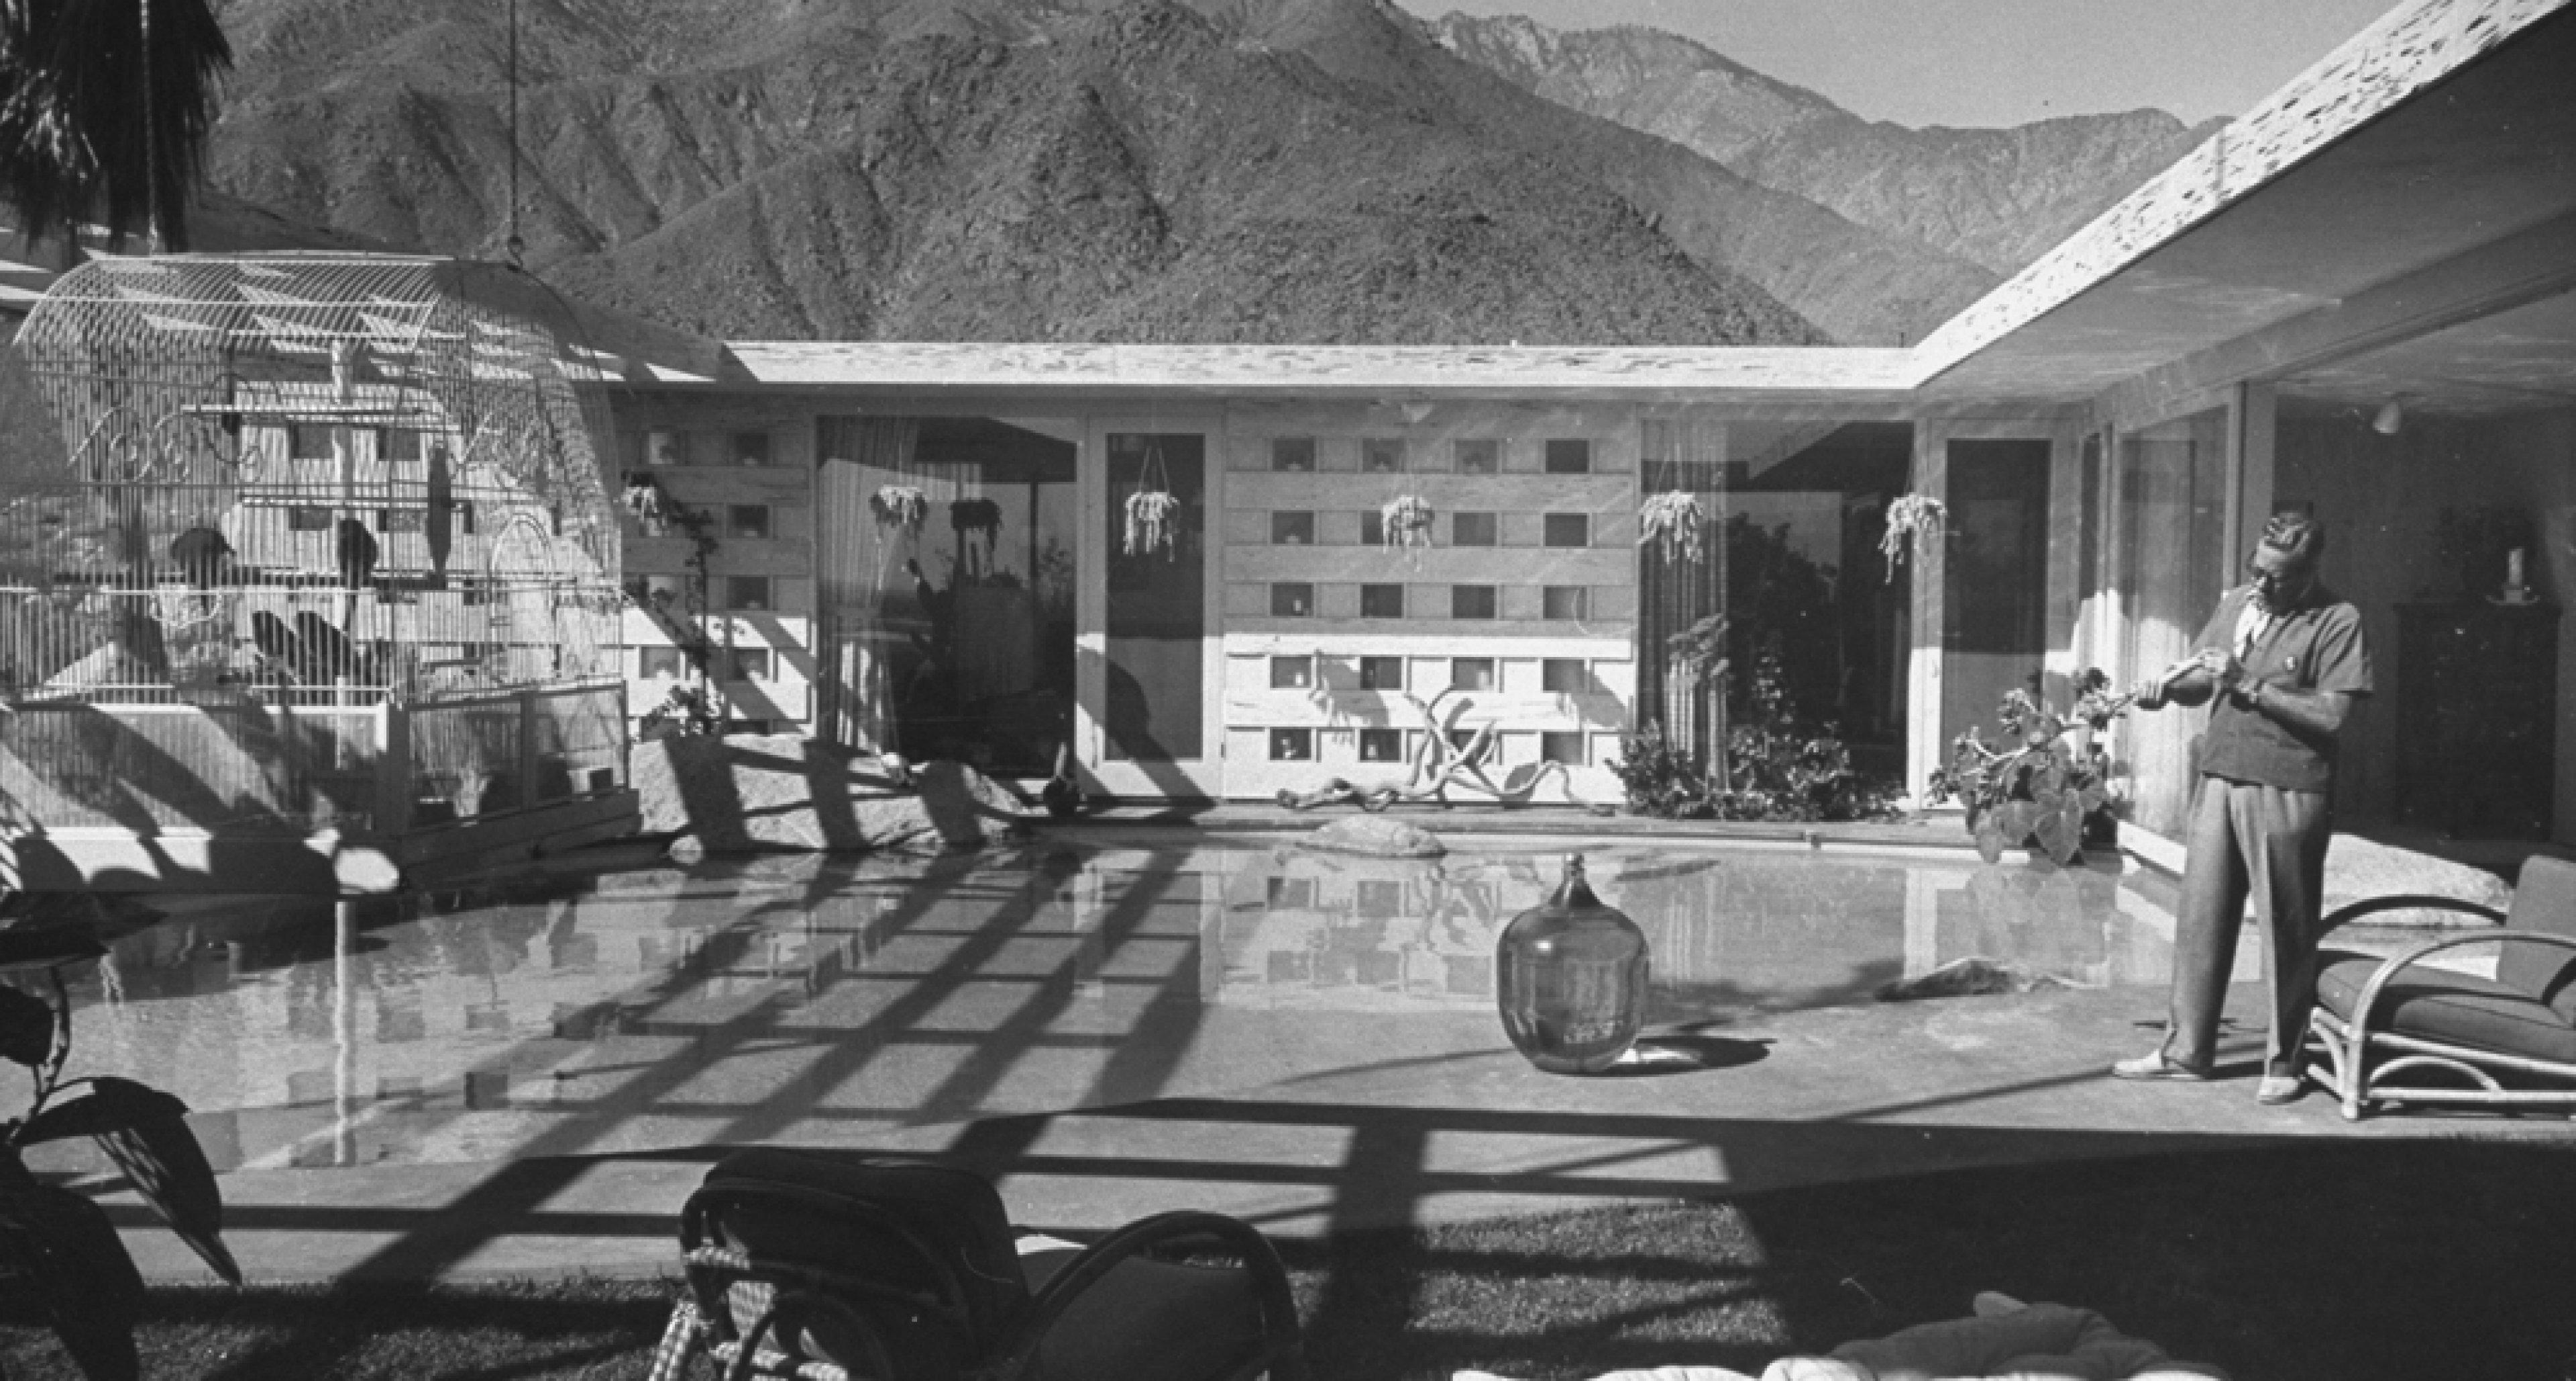 Loewy House by Albert Frey (1946).